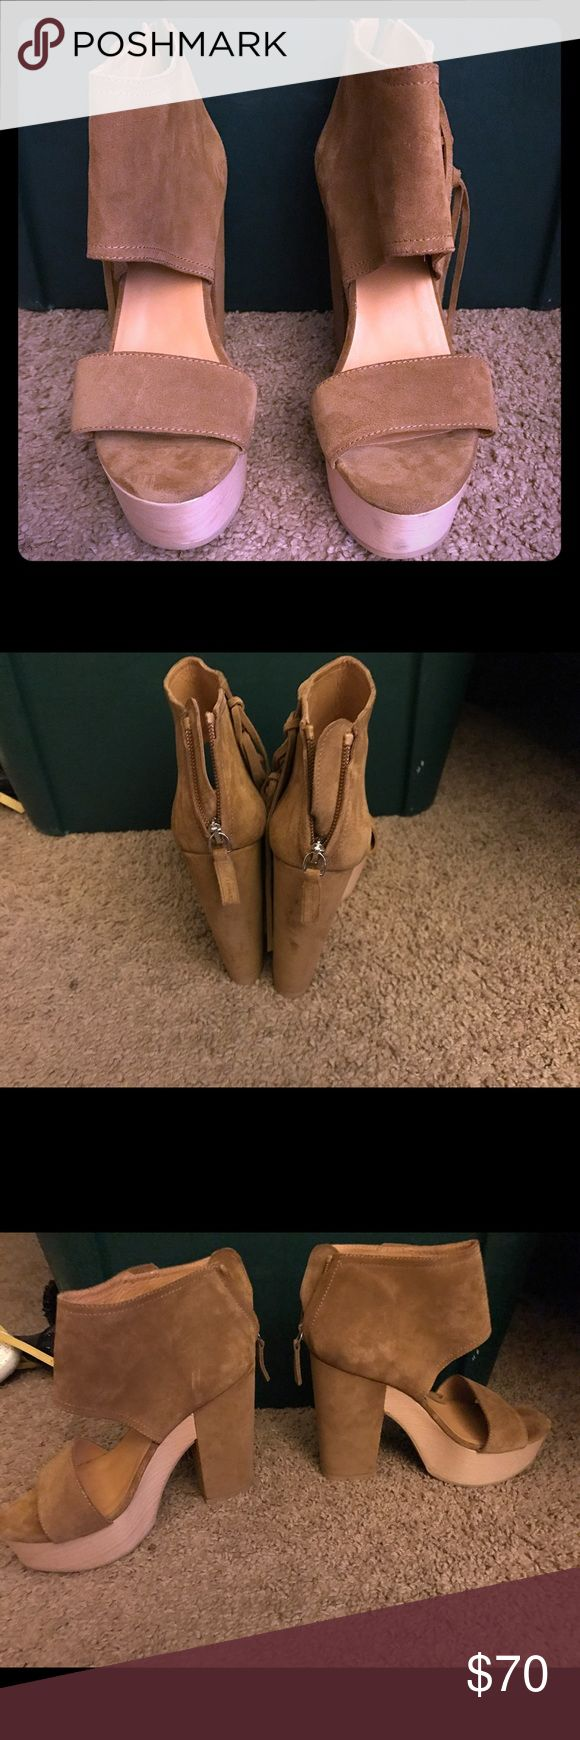 BRAND NEW Suede ,Platform Heels ,RALPH LAUREN‼️‼️ Modern Fringe Suede + Wood Platform Heels , Shoes - Polo Ralph Lauren..... NEVER WORN‼️‼️ Polo by Ralph Lauren Shoes Platforms